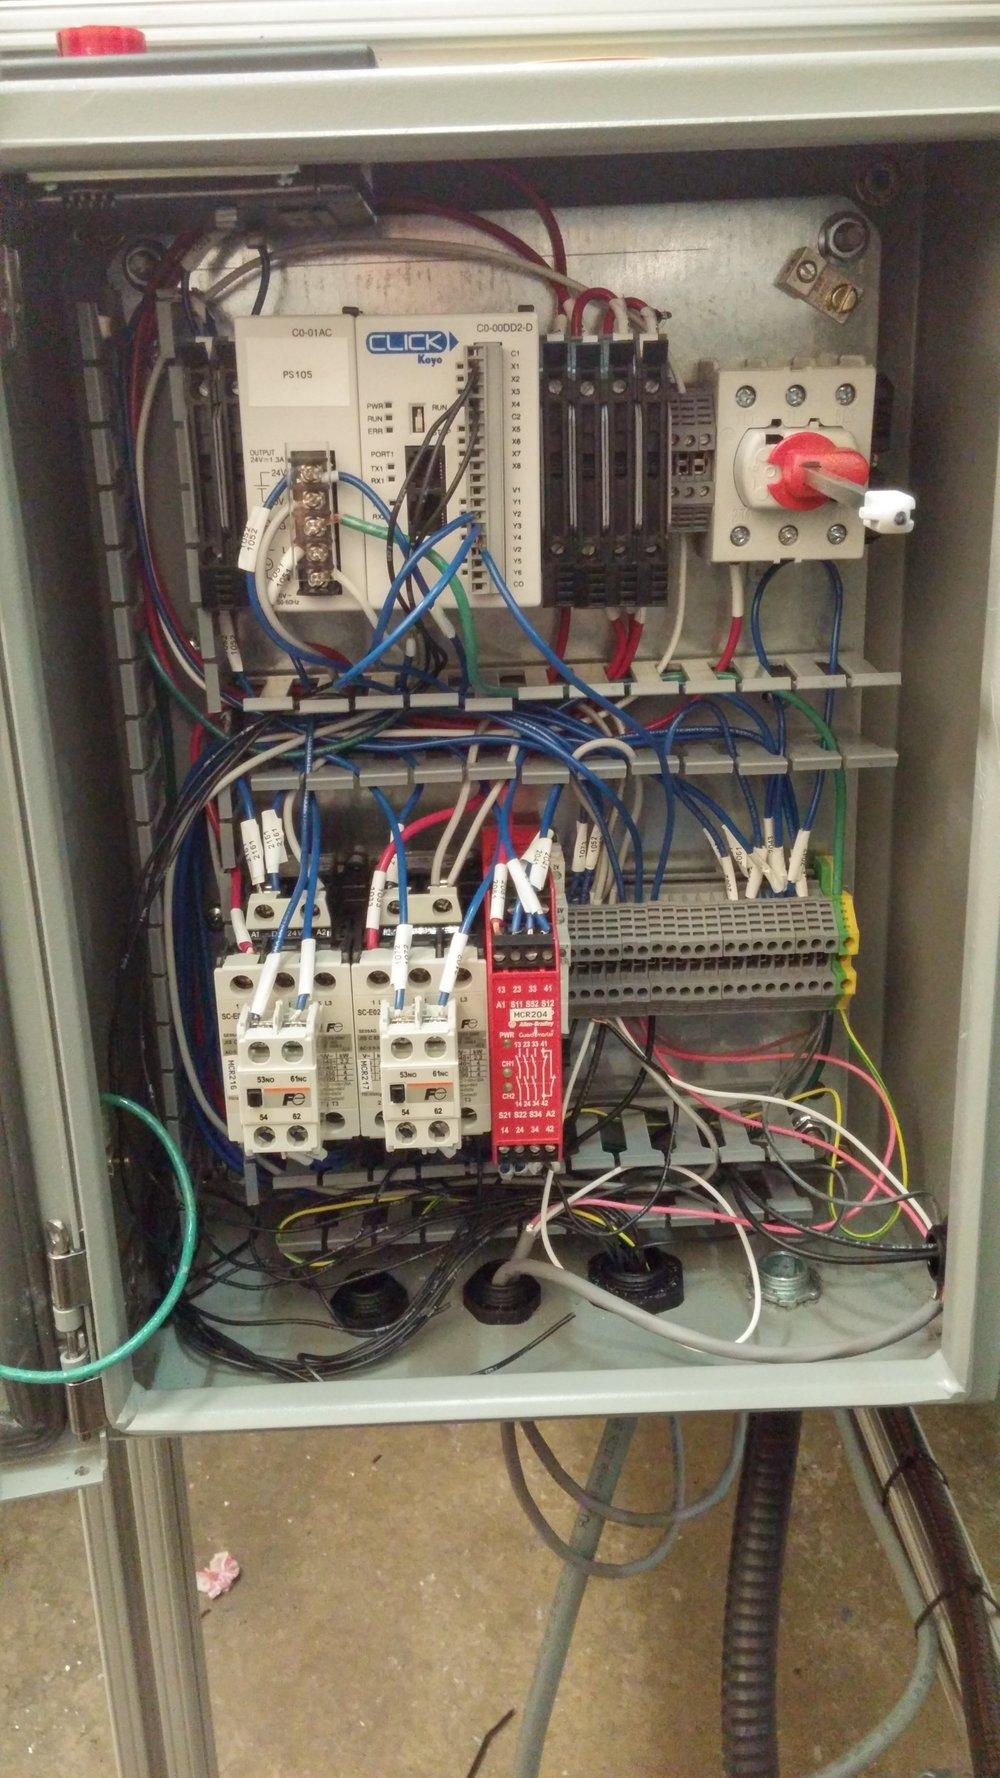 Control box , I/O controller programmed with ladder logic